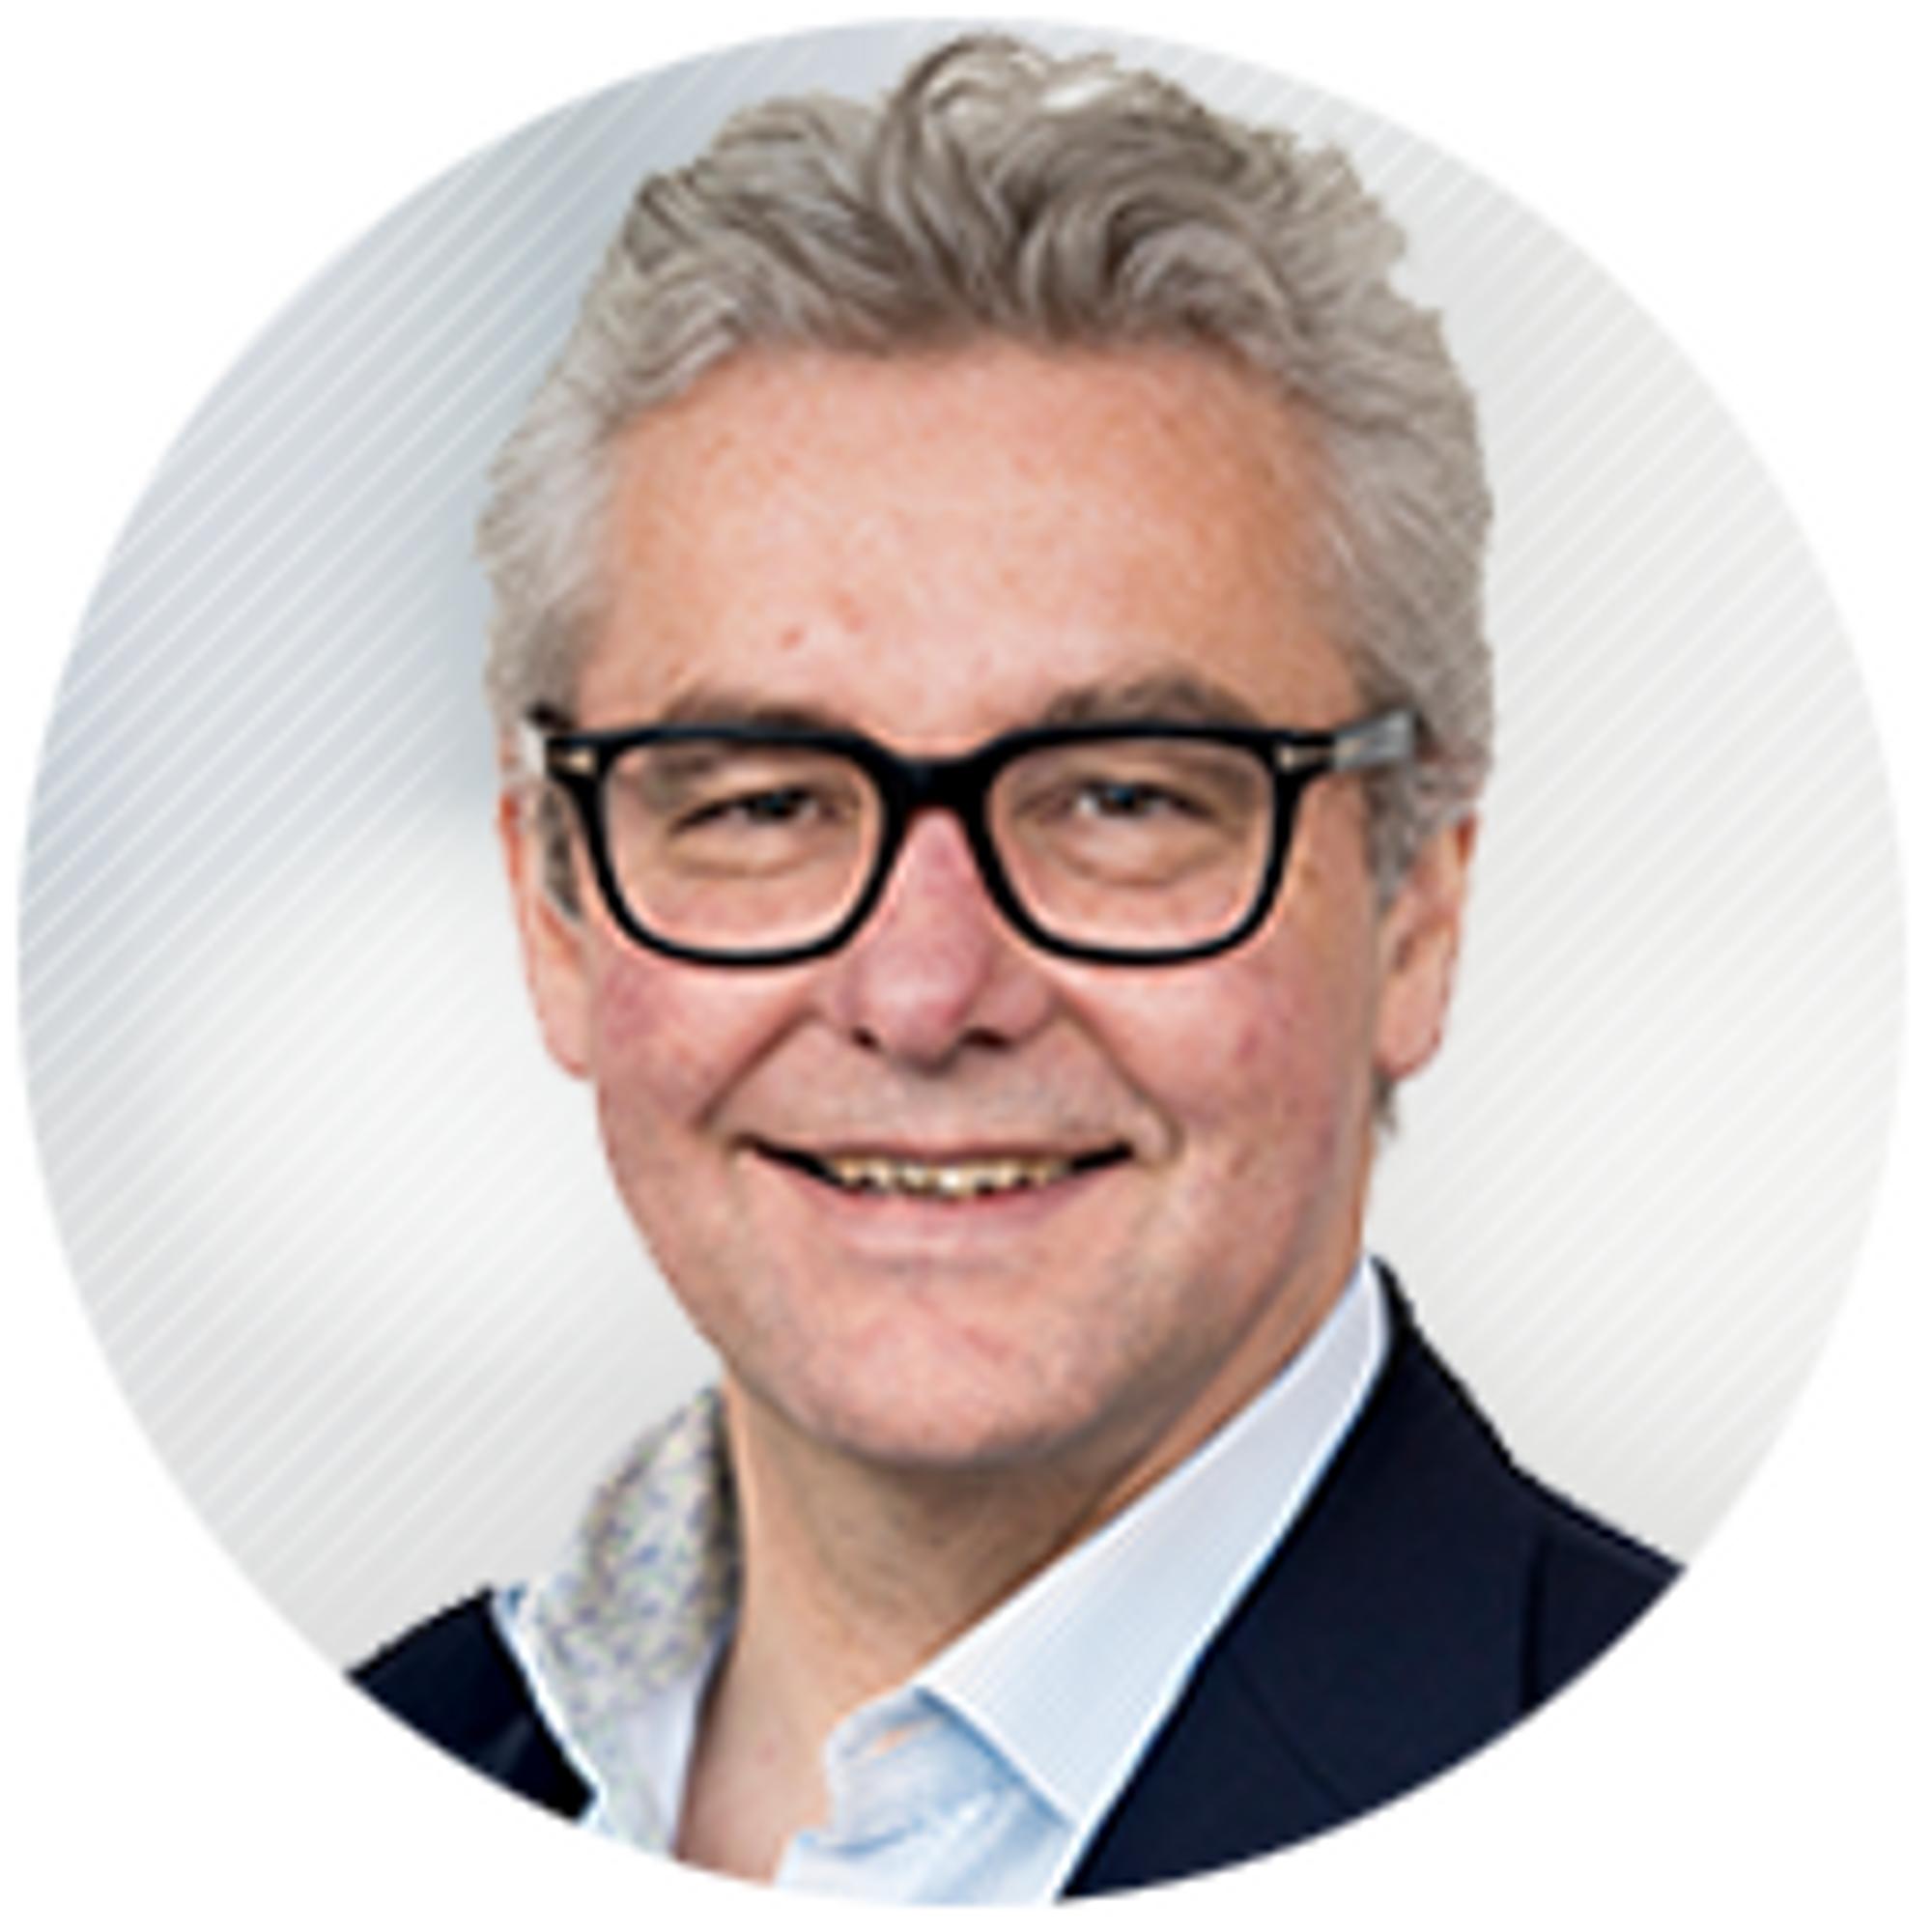 Hans Petter Hoel